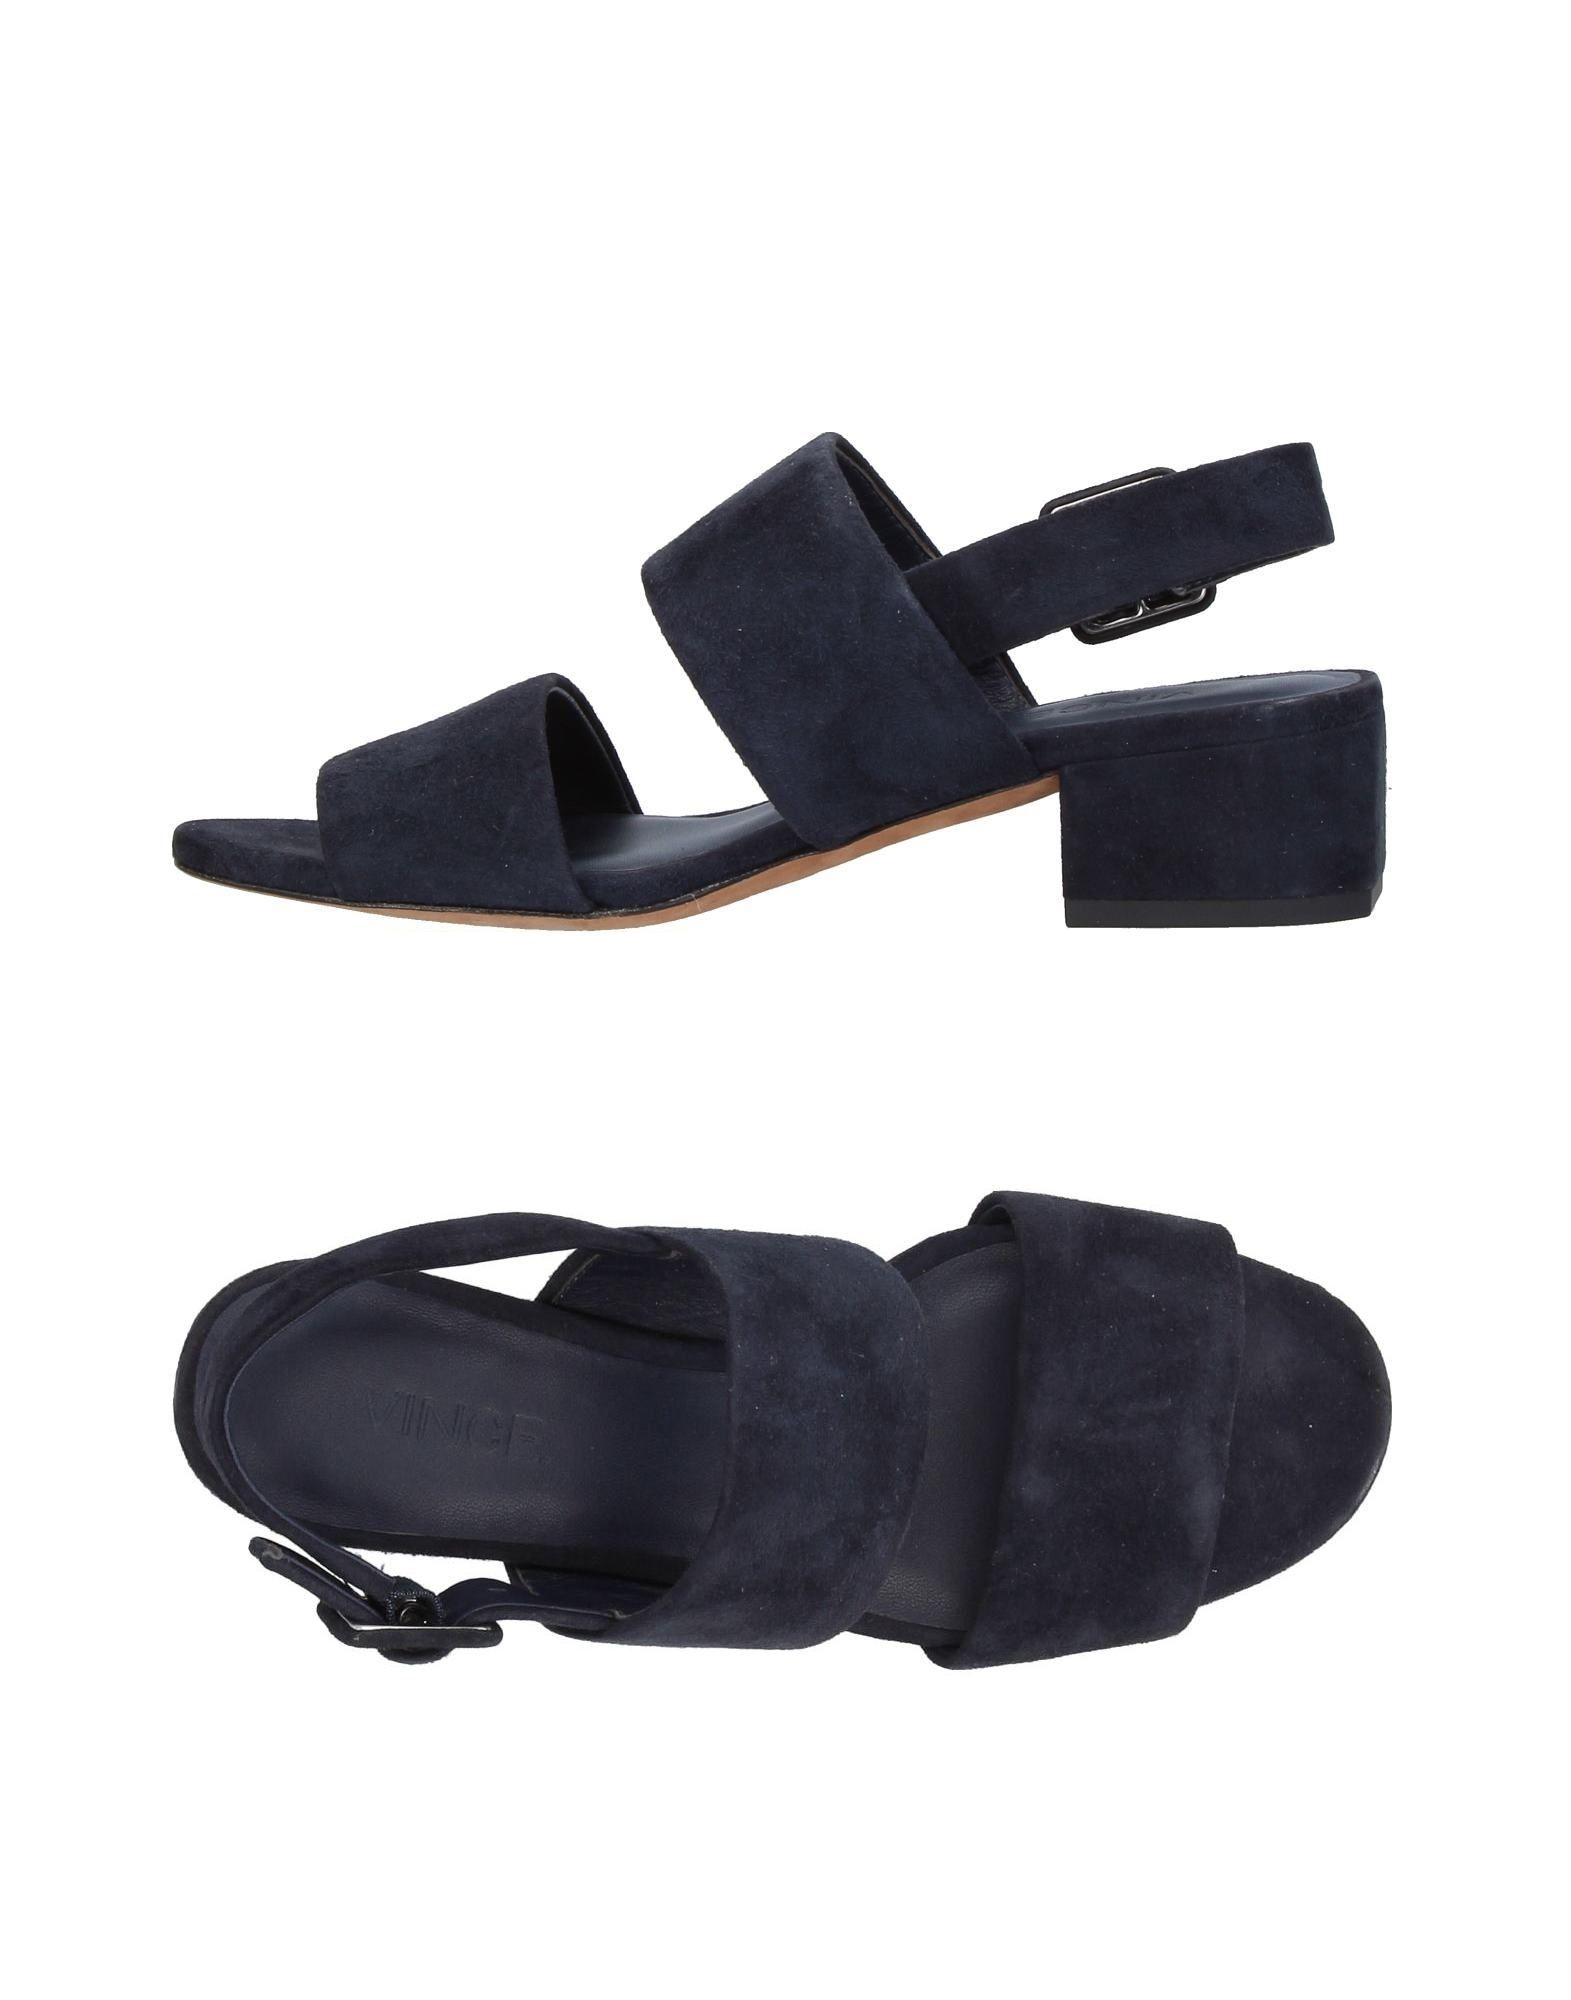 Haltbare Mode billige Schuhe Vince. Sandalen Damen  11415400TF Heiße Schuhe